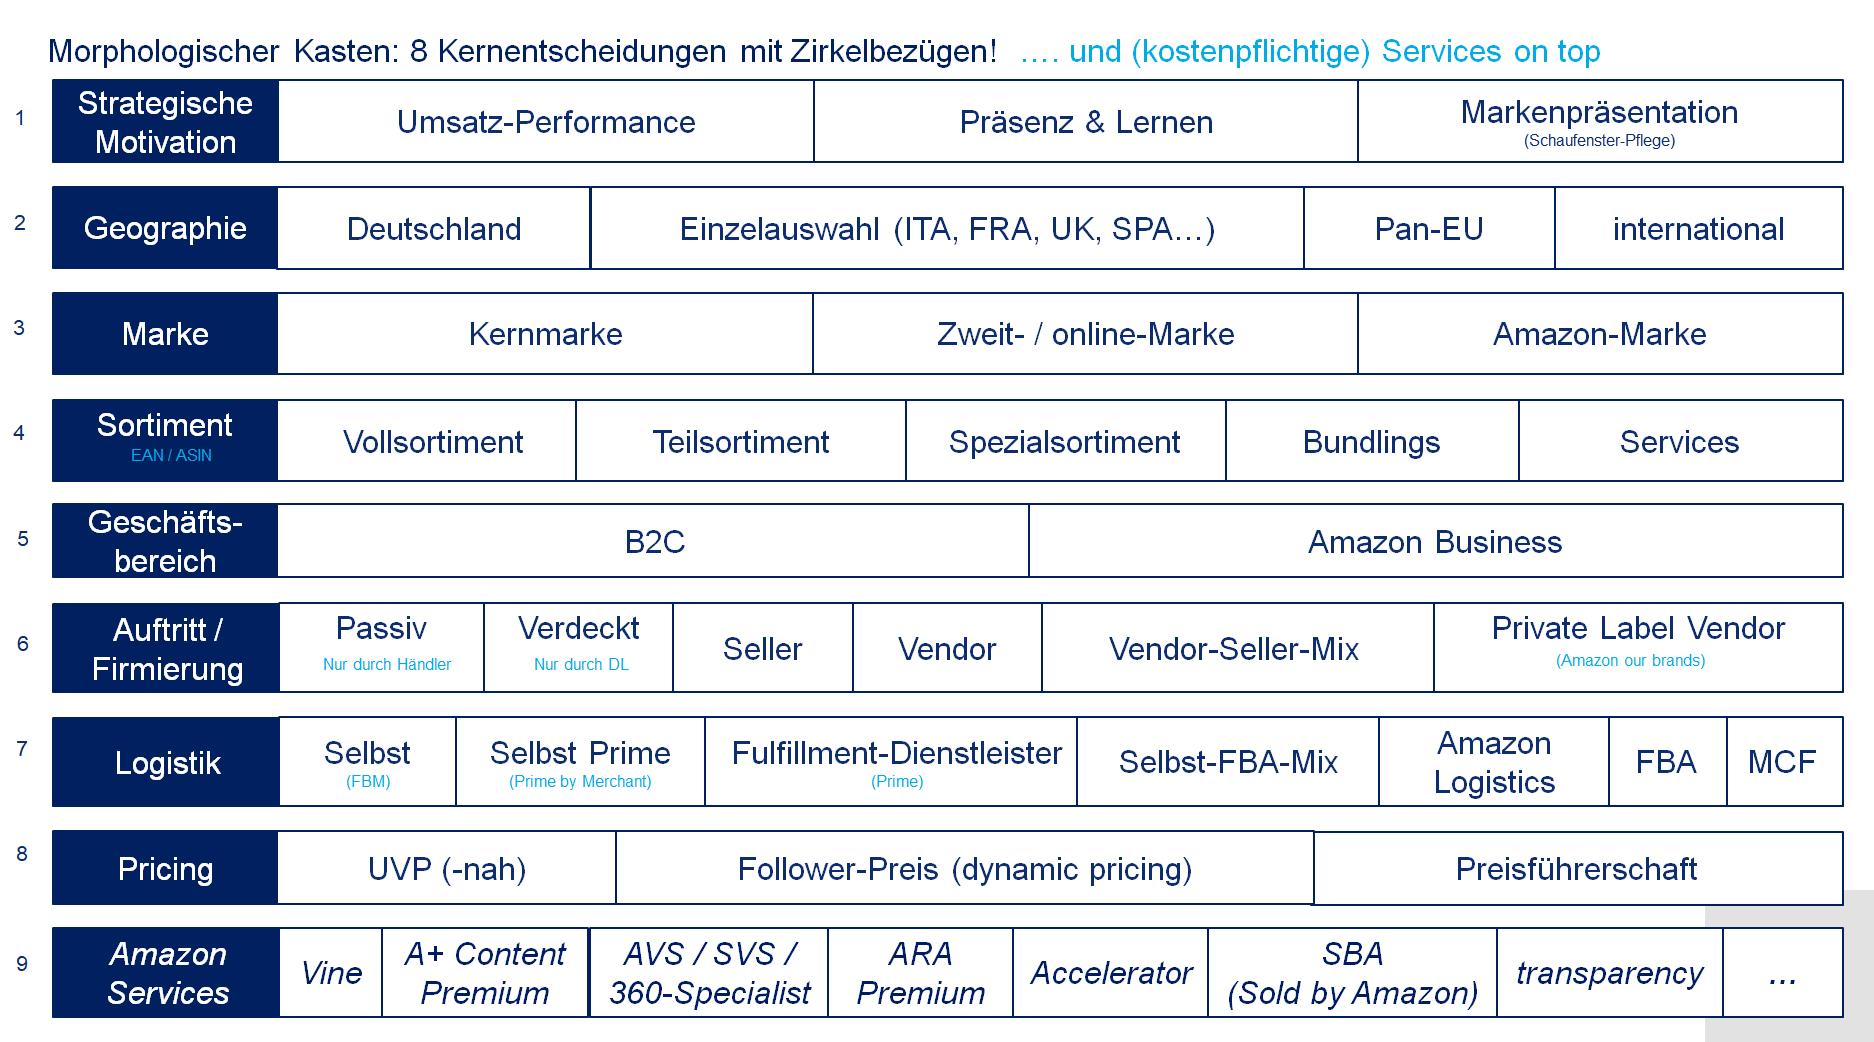 Amazon Strategie Vendor und Seller morphologischer Kasten